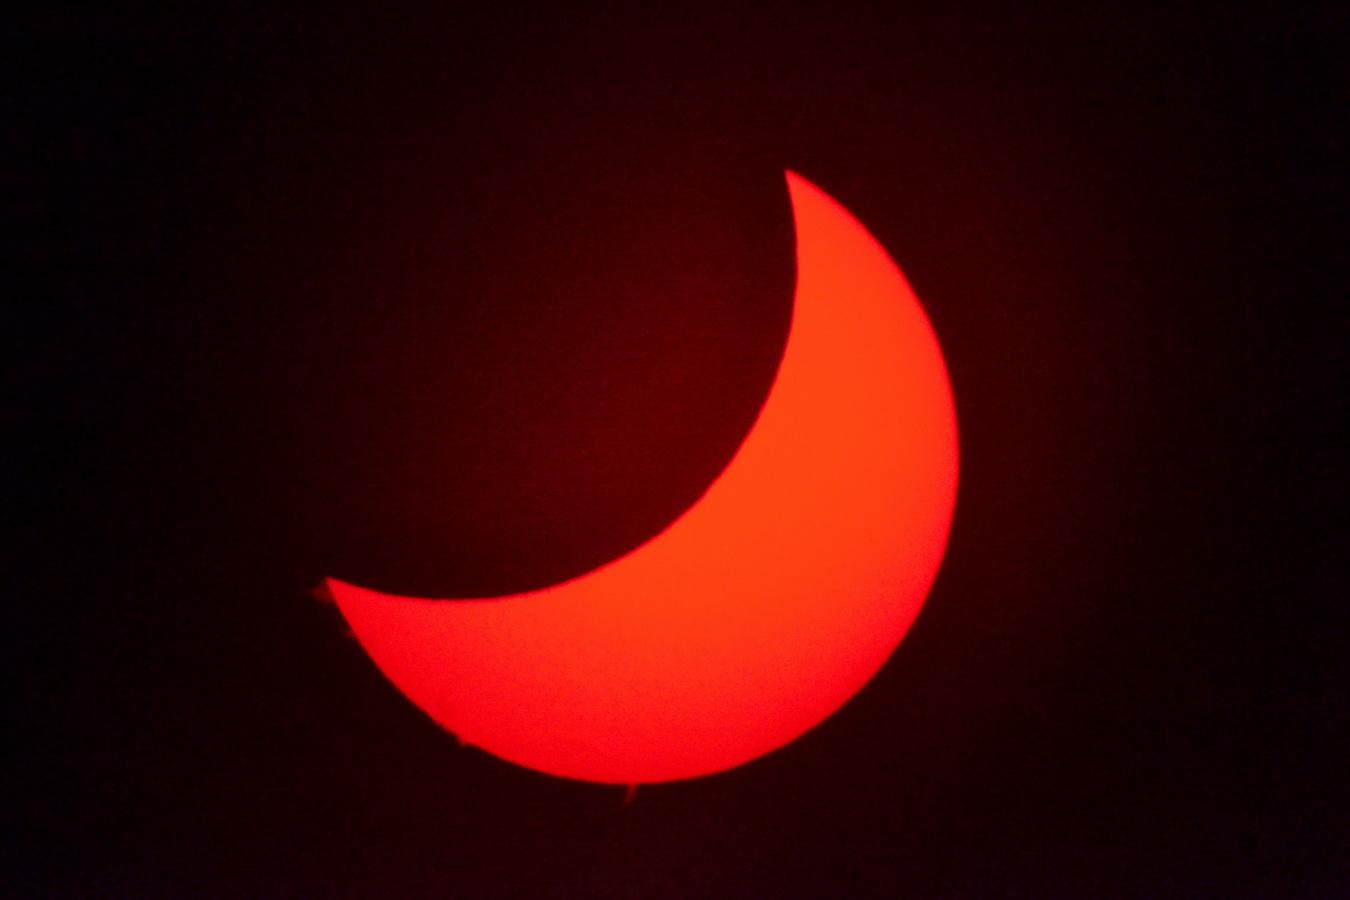 Eclipse parcial de Sol del 20/3/2015